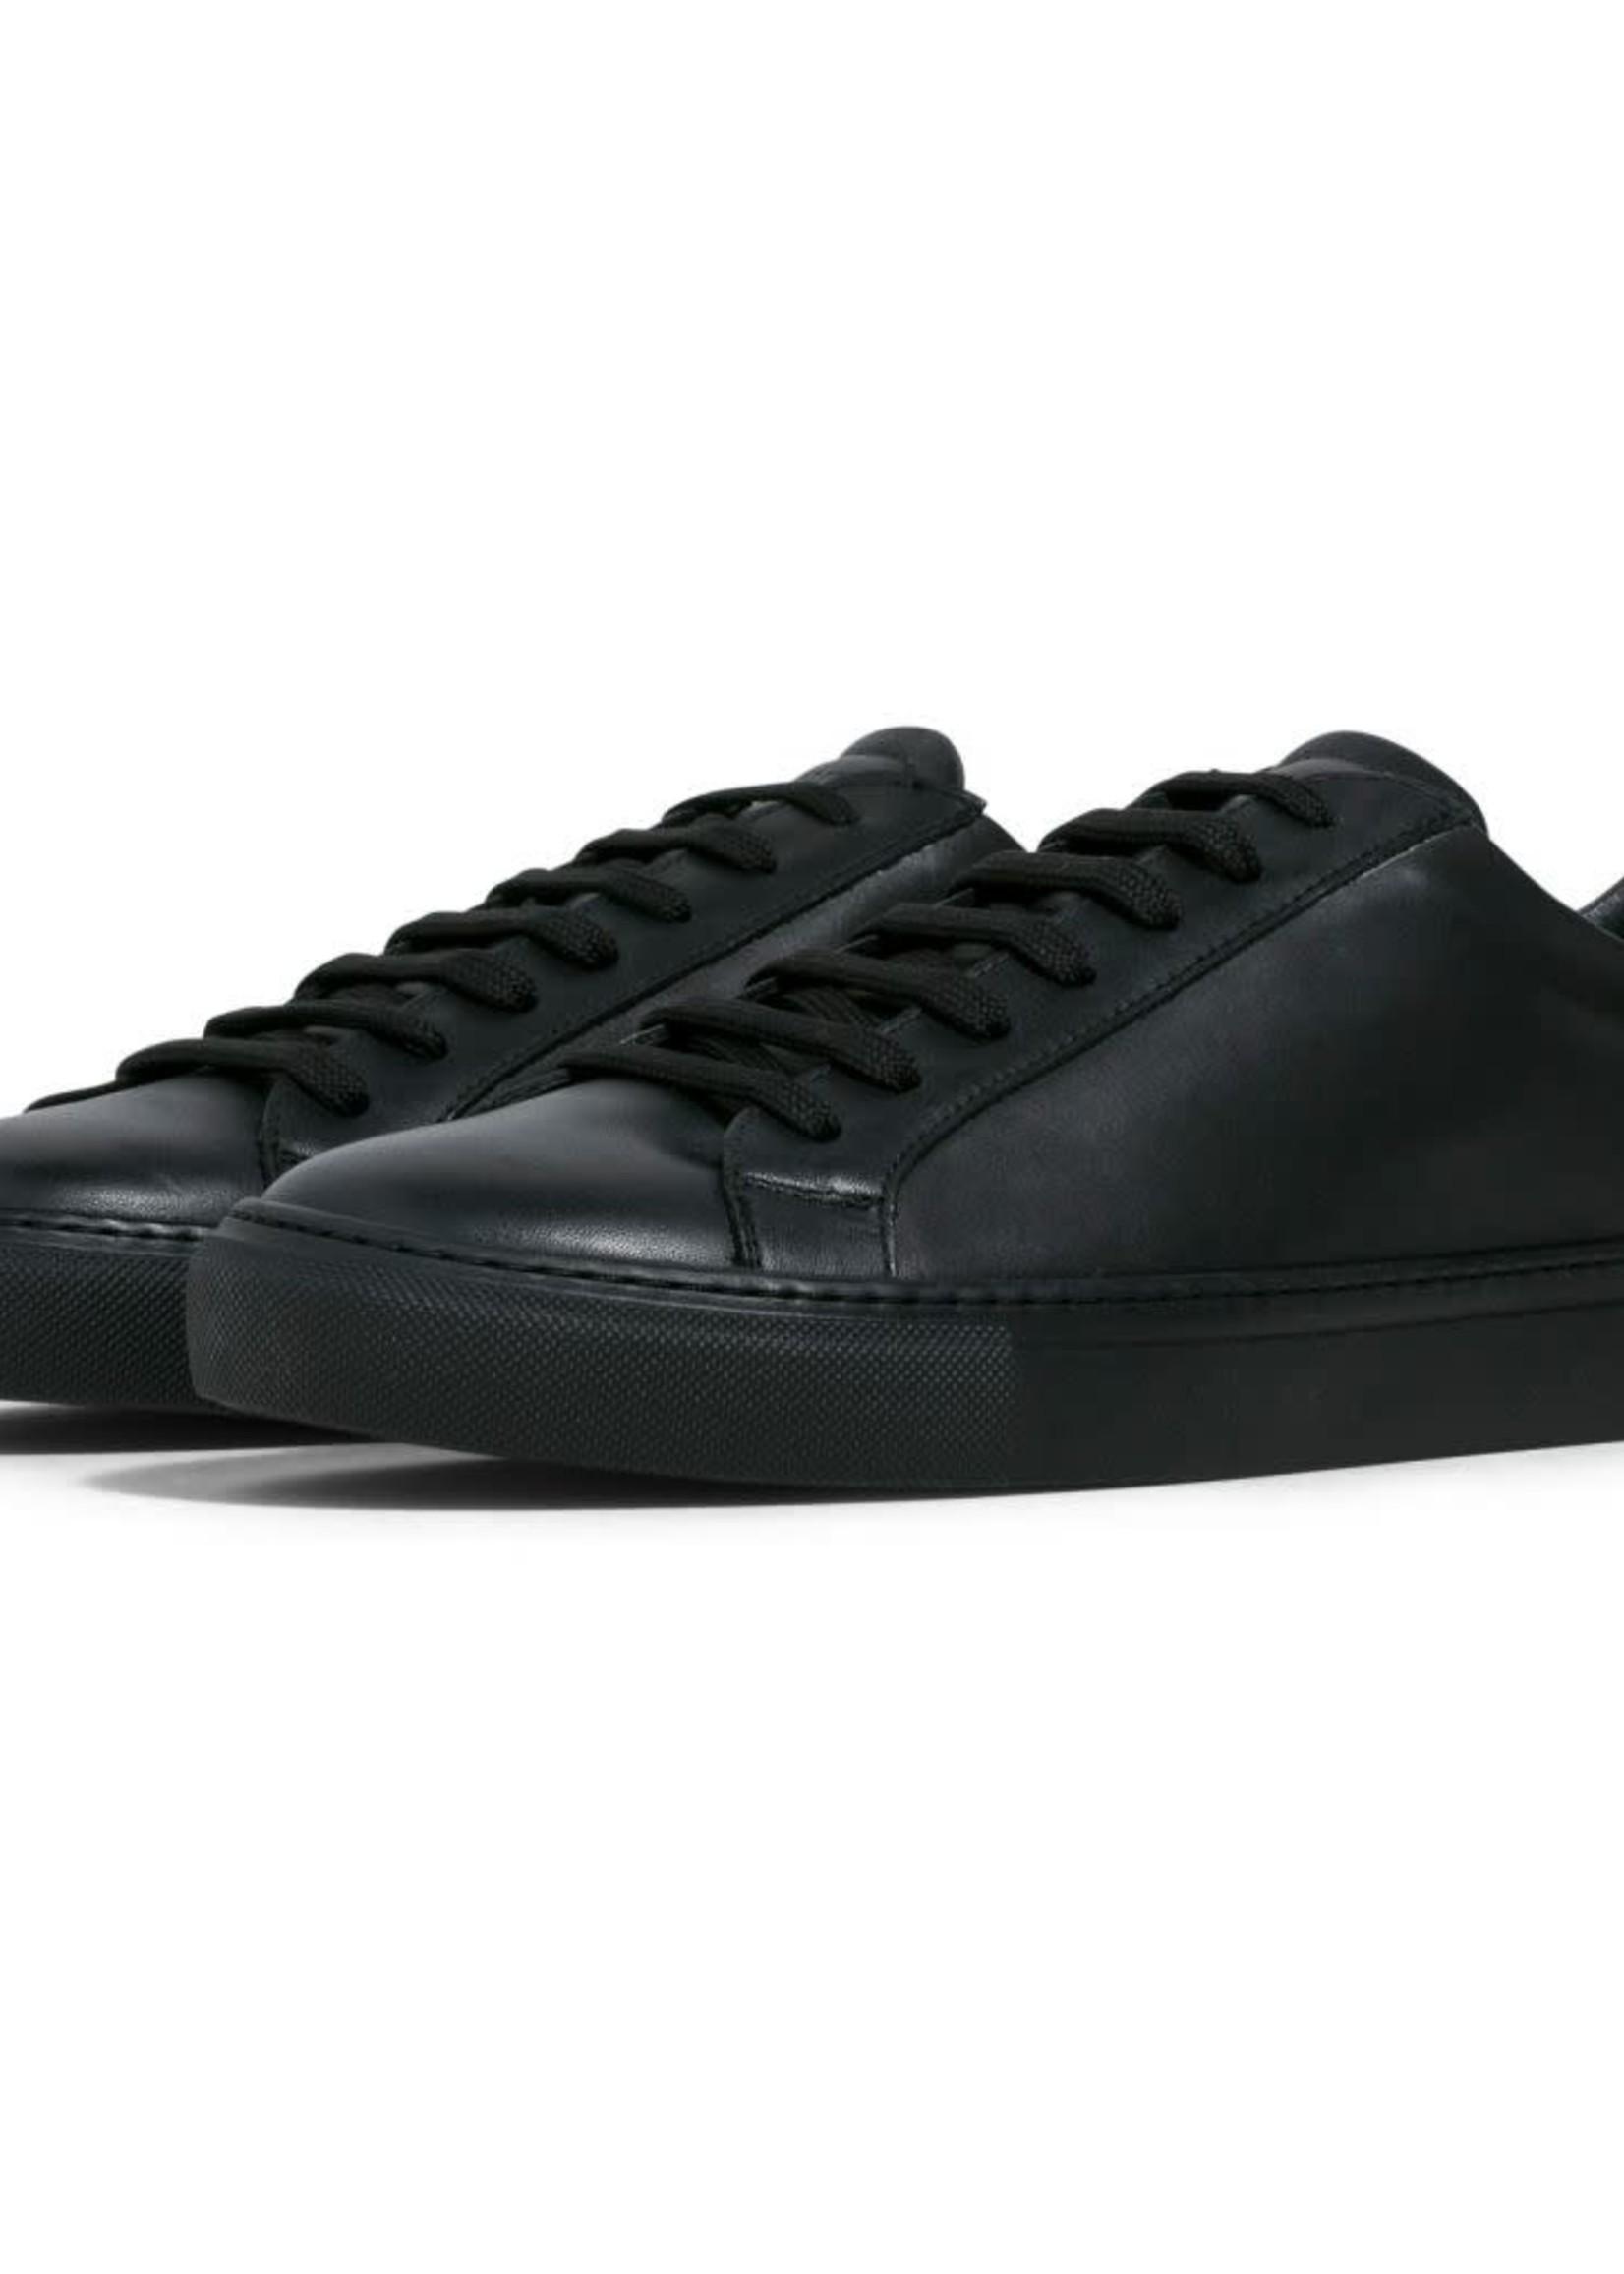 Garment Project Type Sneaker (All Black)